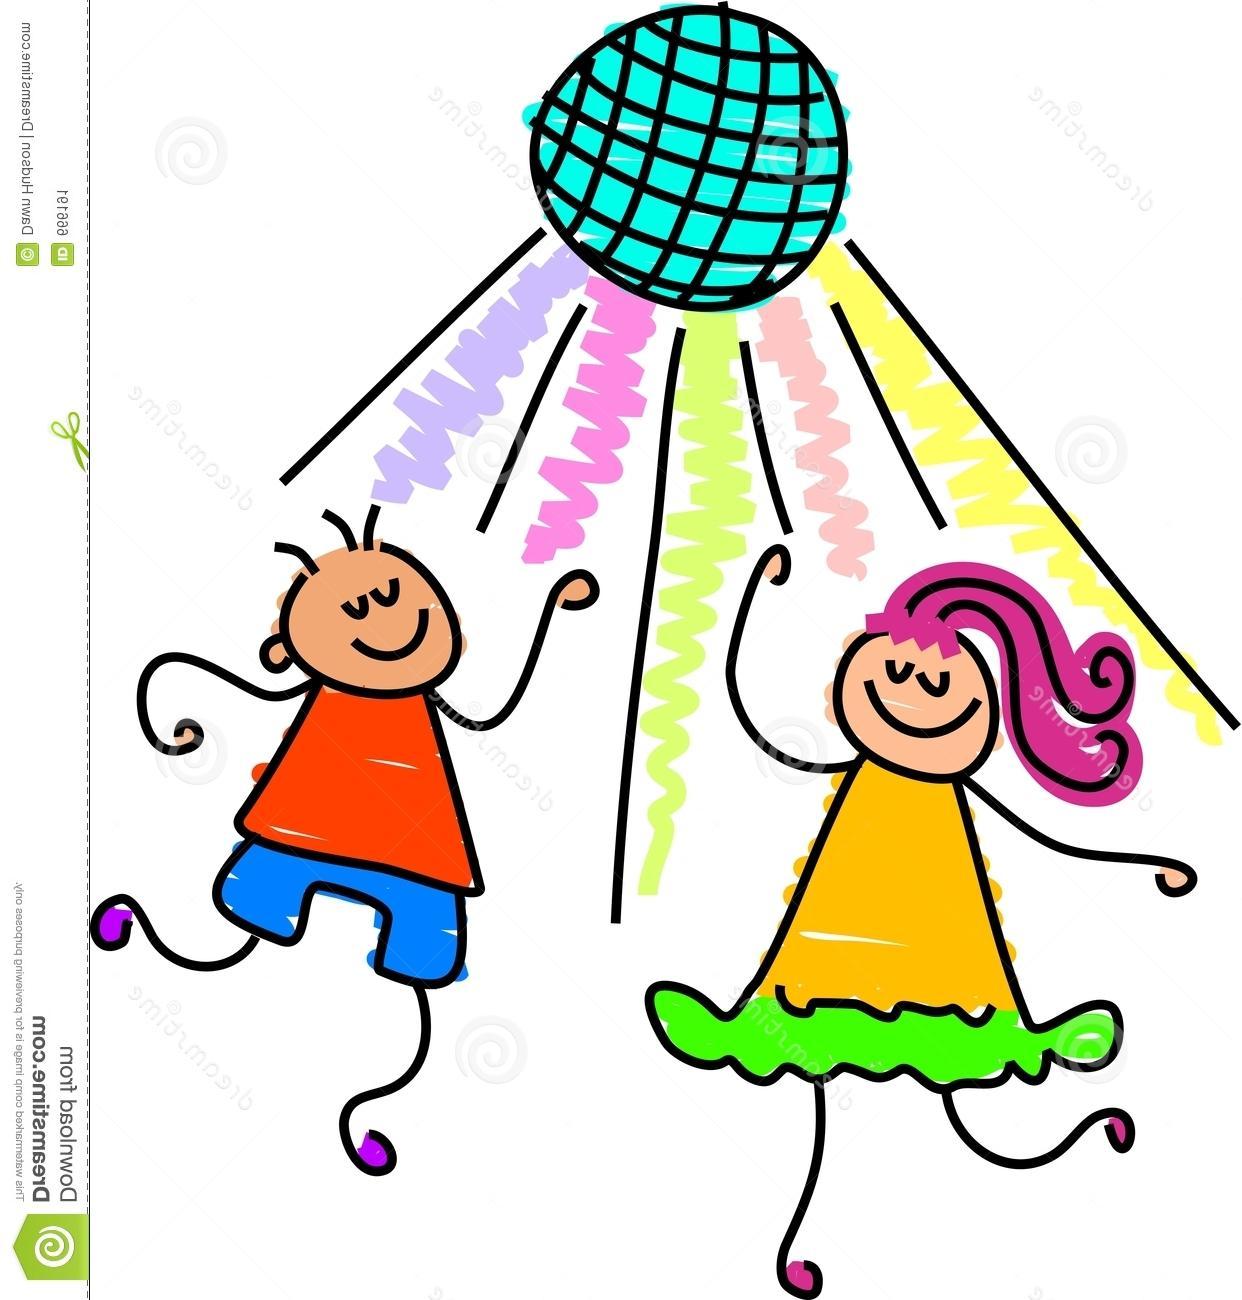 1242x1300 Hd Child Dancer Clipart Dancing Kids Design